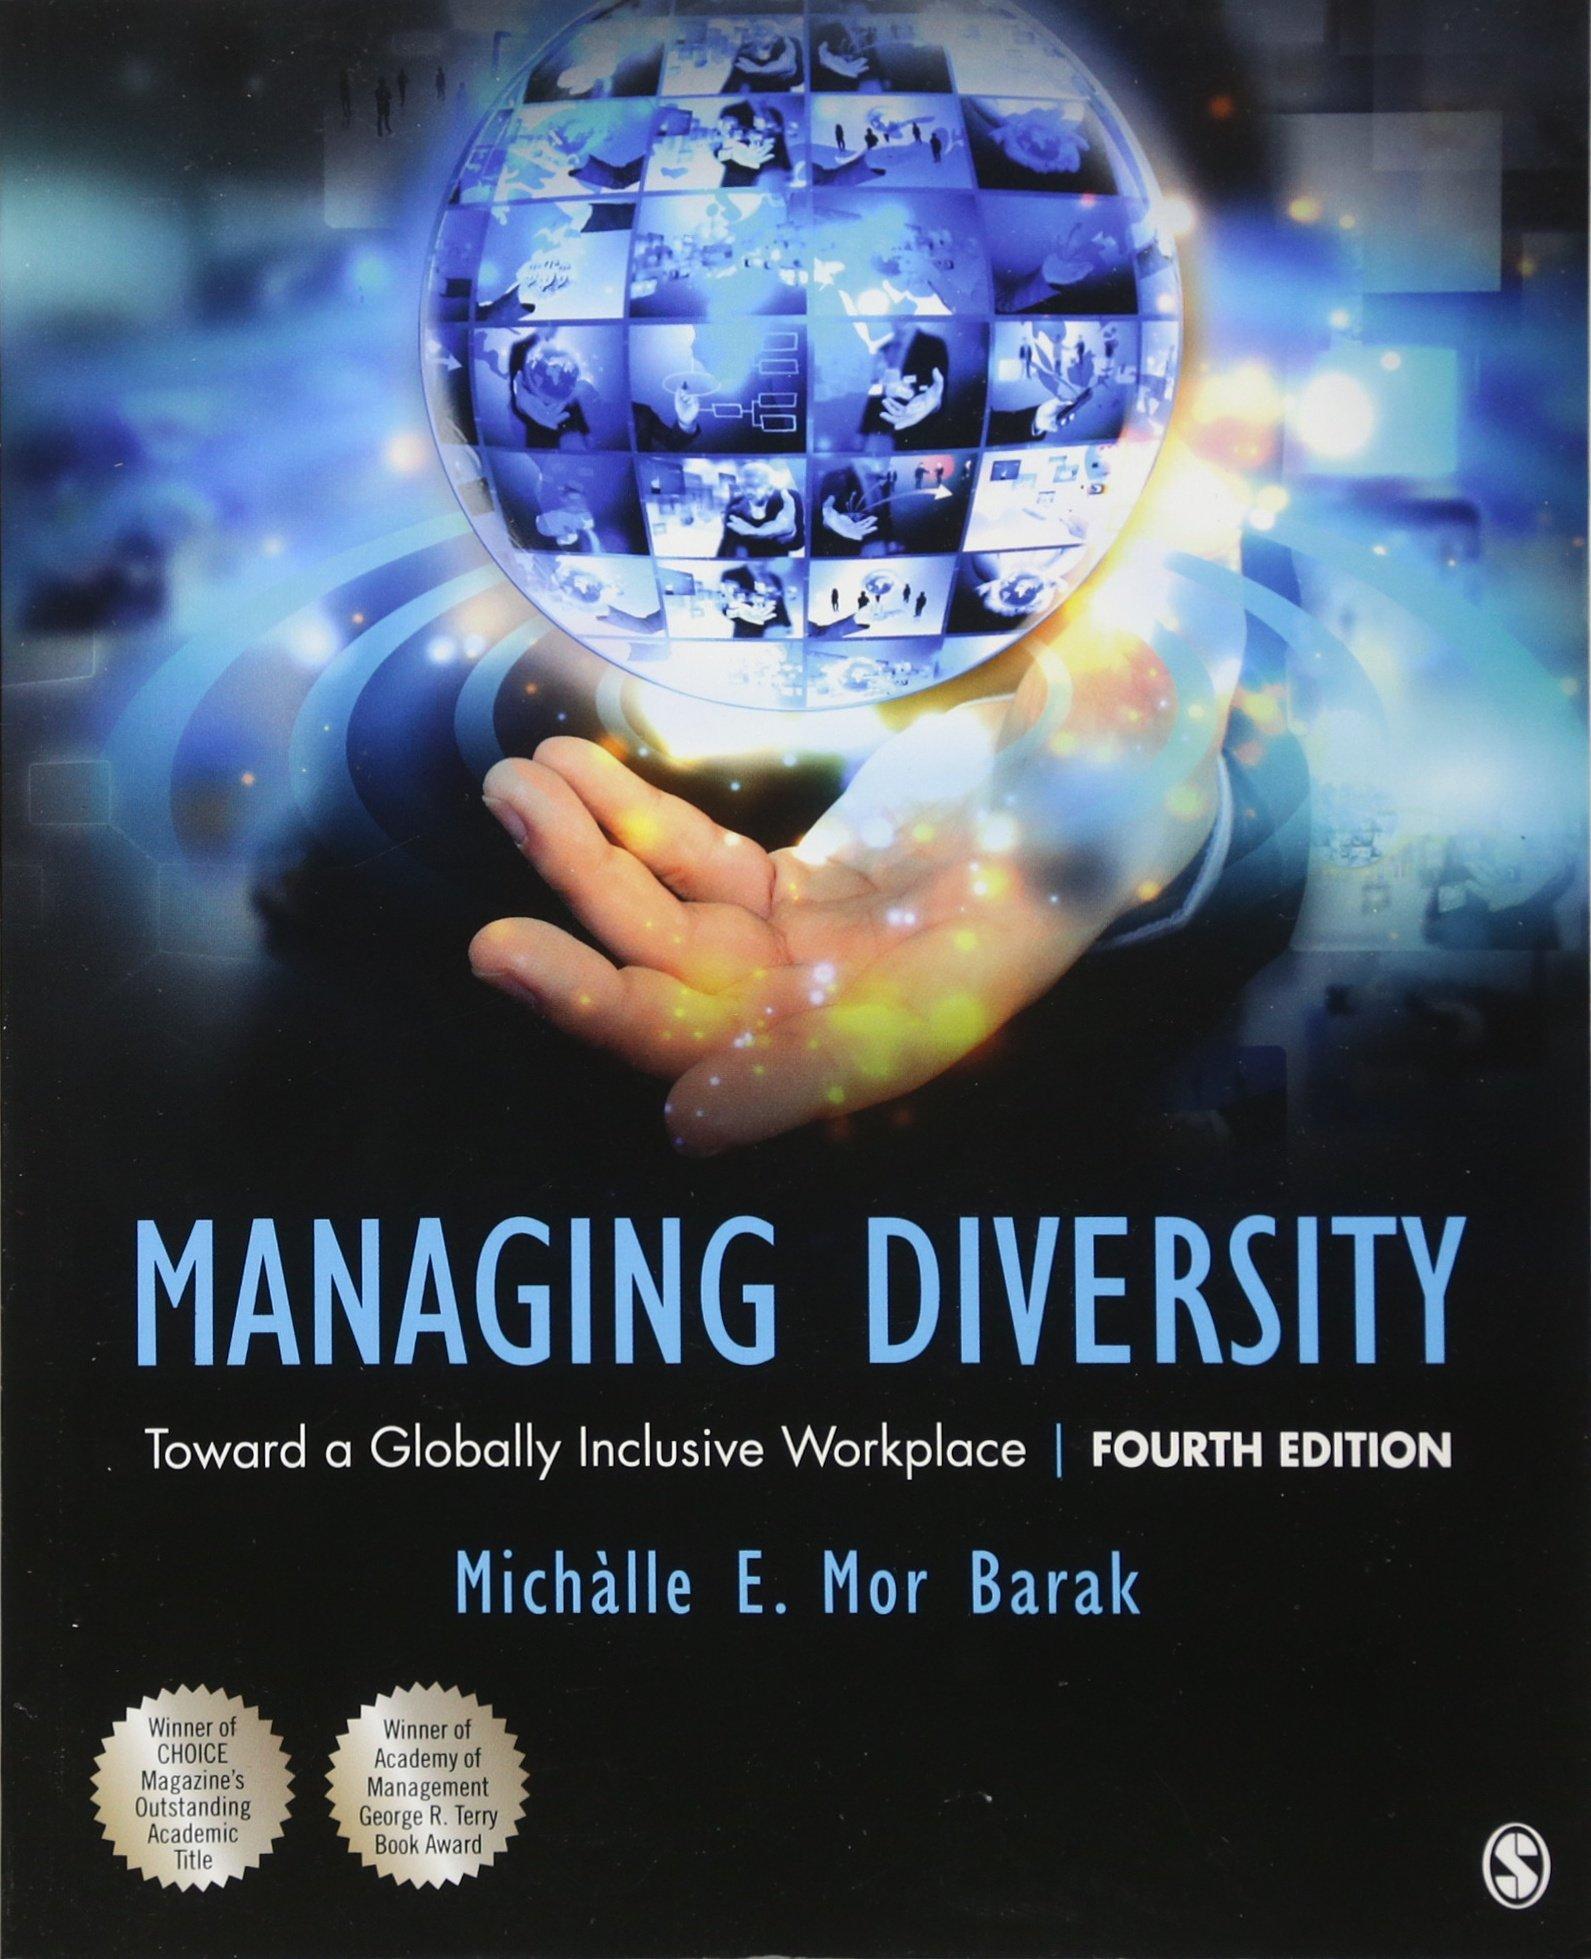 Managing Diversity: Toward a Globally Inclusive Workplace: Amazon.co.uk:  Michalle E. Mor Barak: 9781483386126: Books